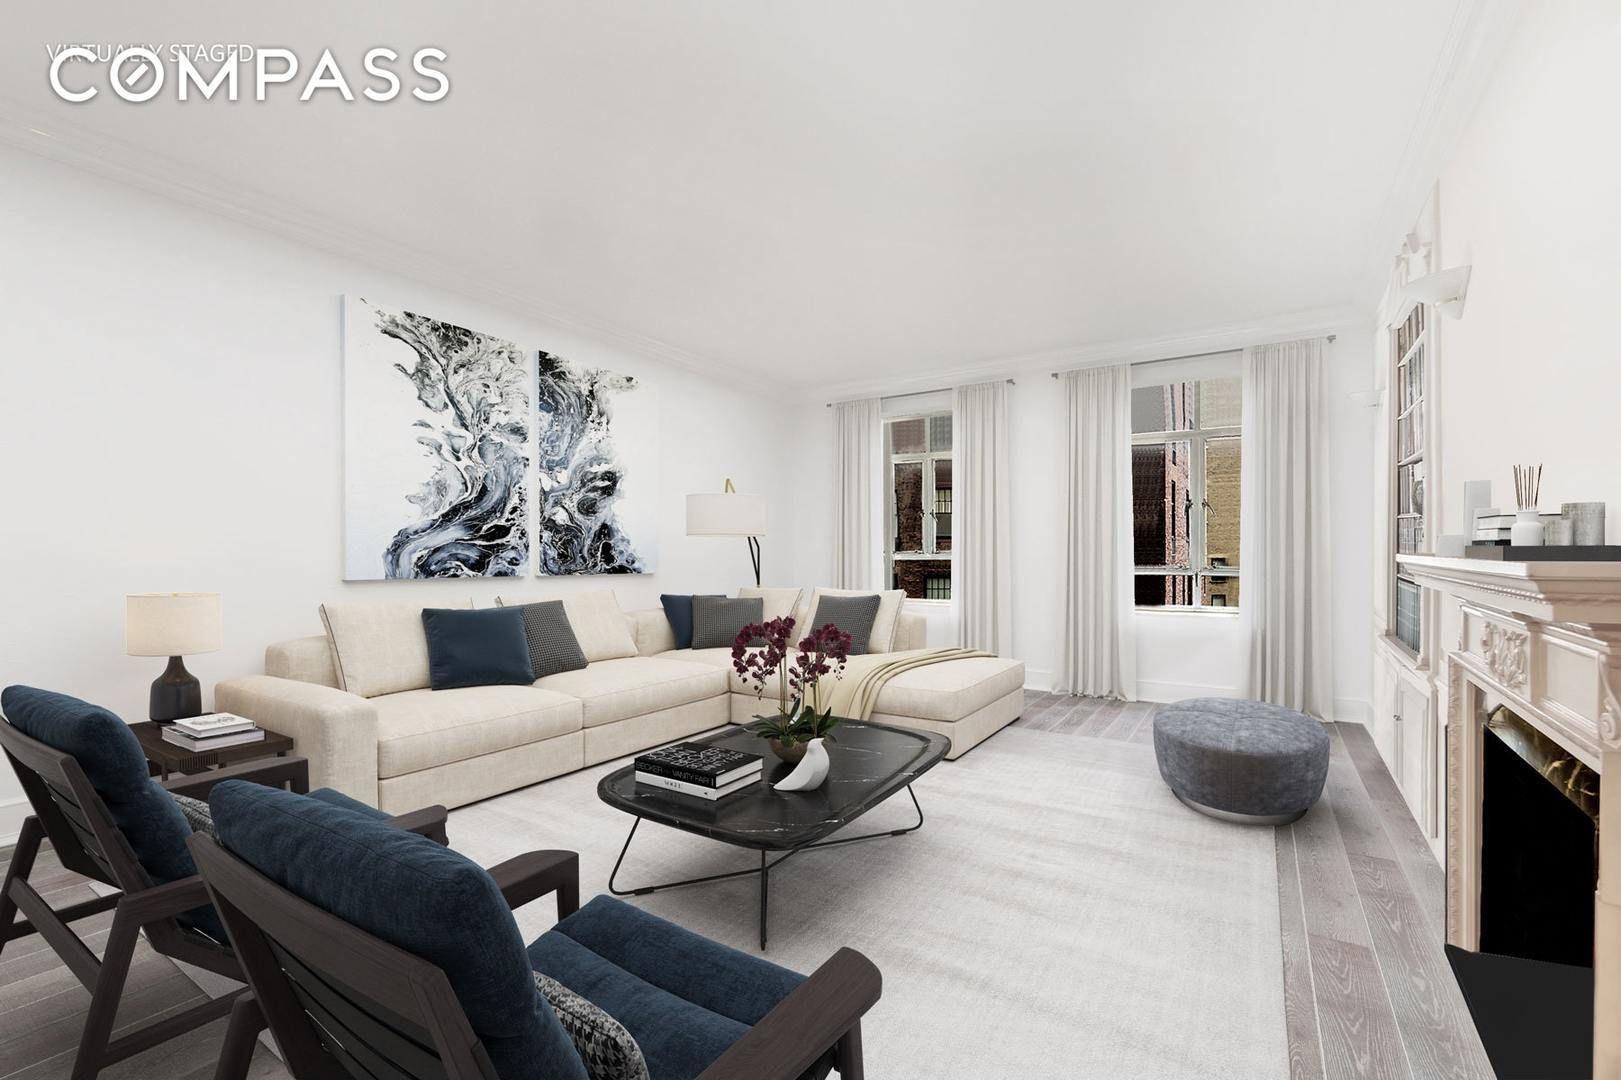 Apartment for sale at 115 Central Park West, Apt 9-B